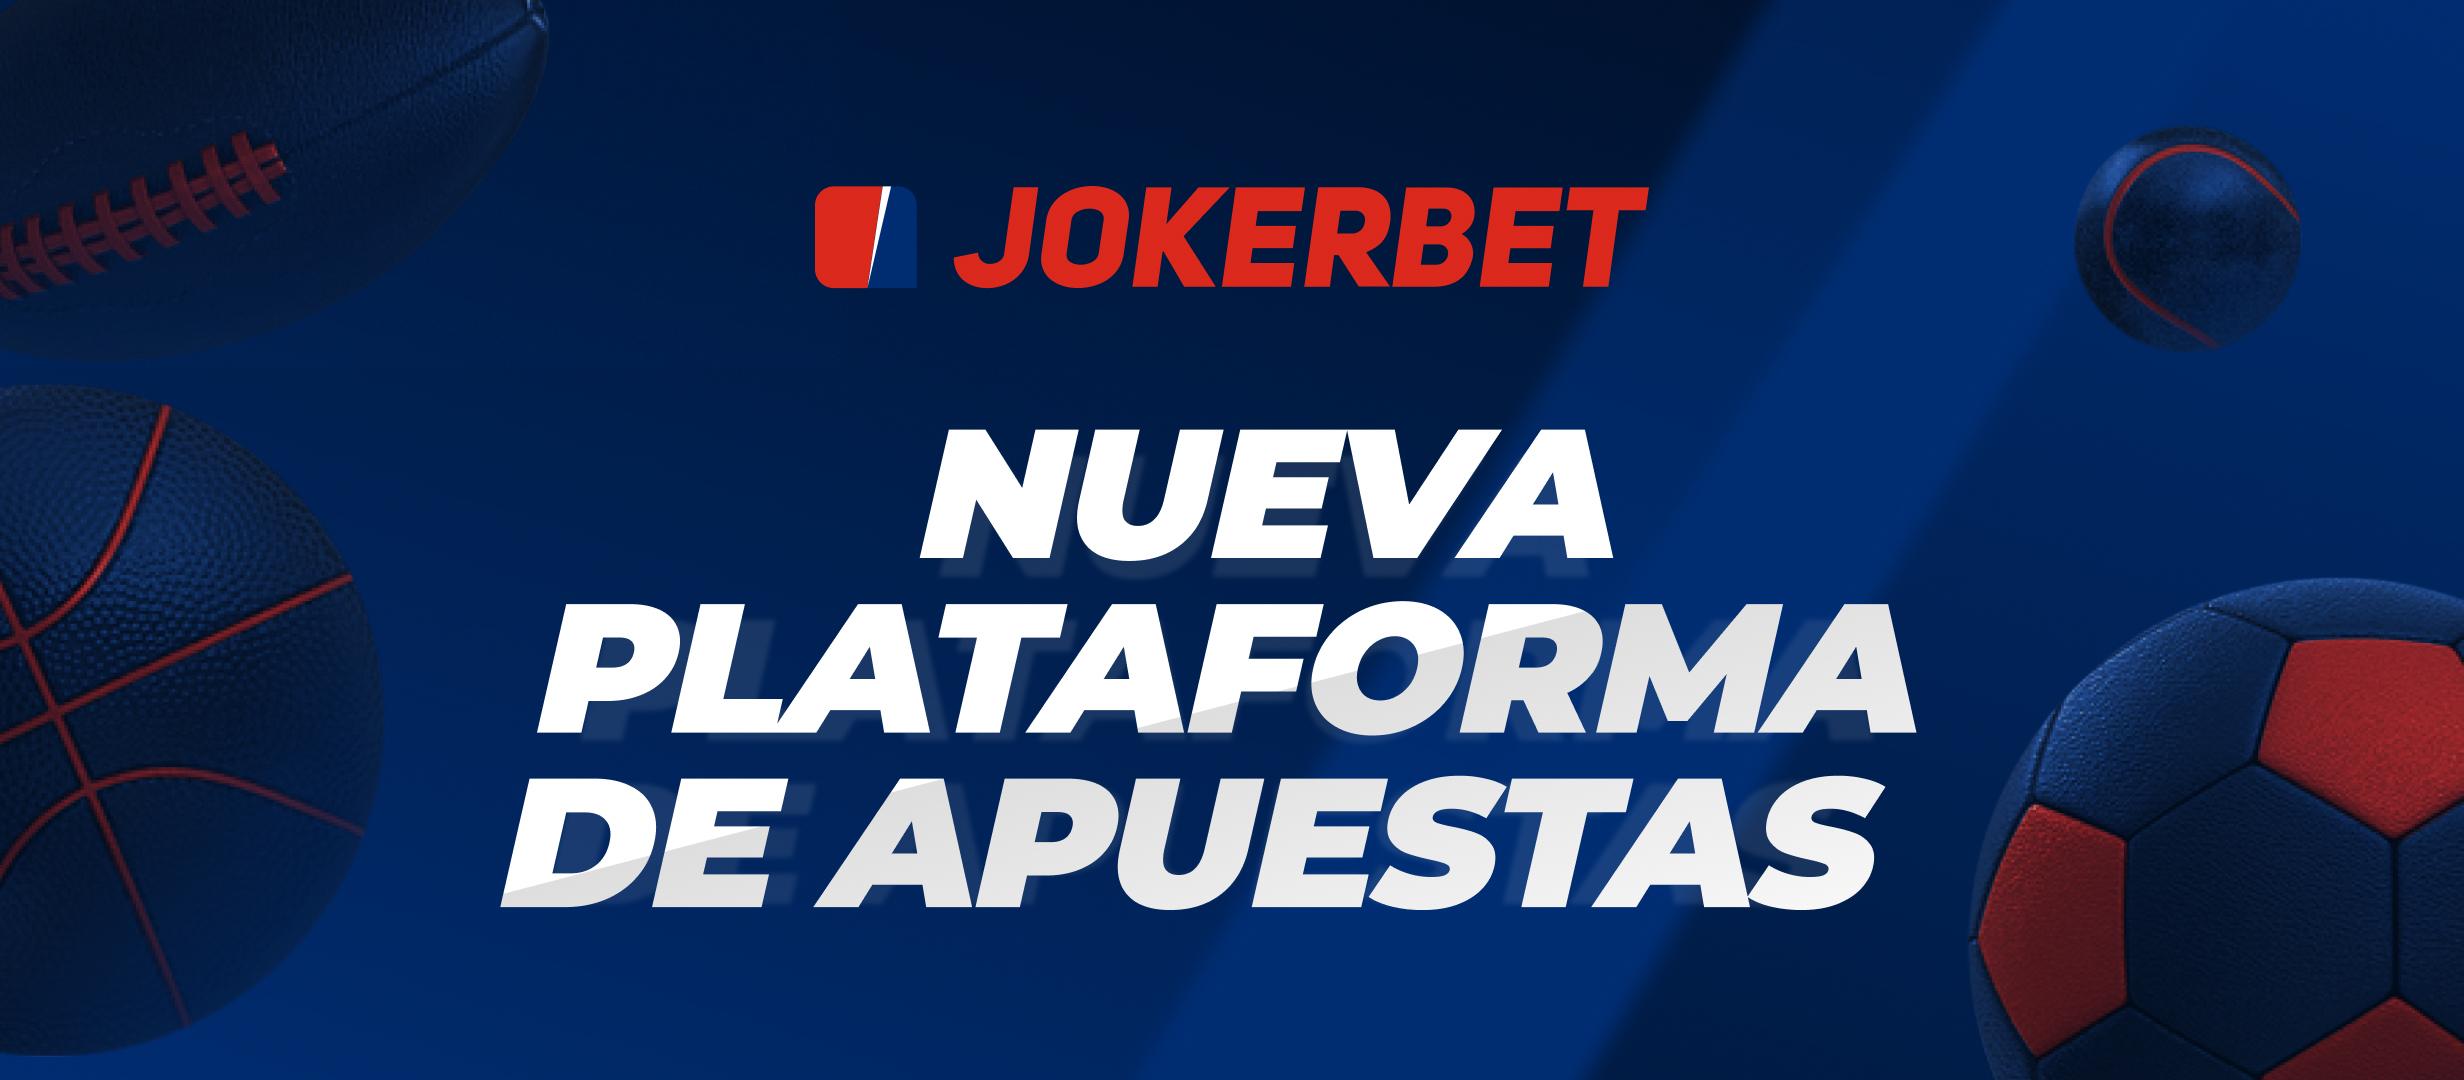 JOKERBET estrena plataforma de apuestas